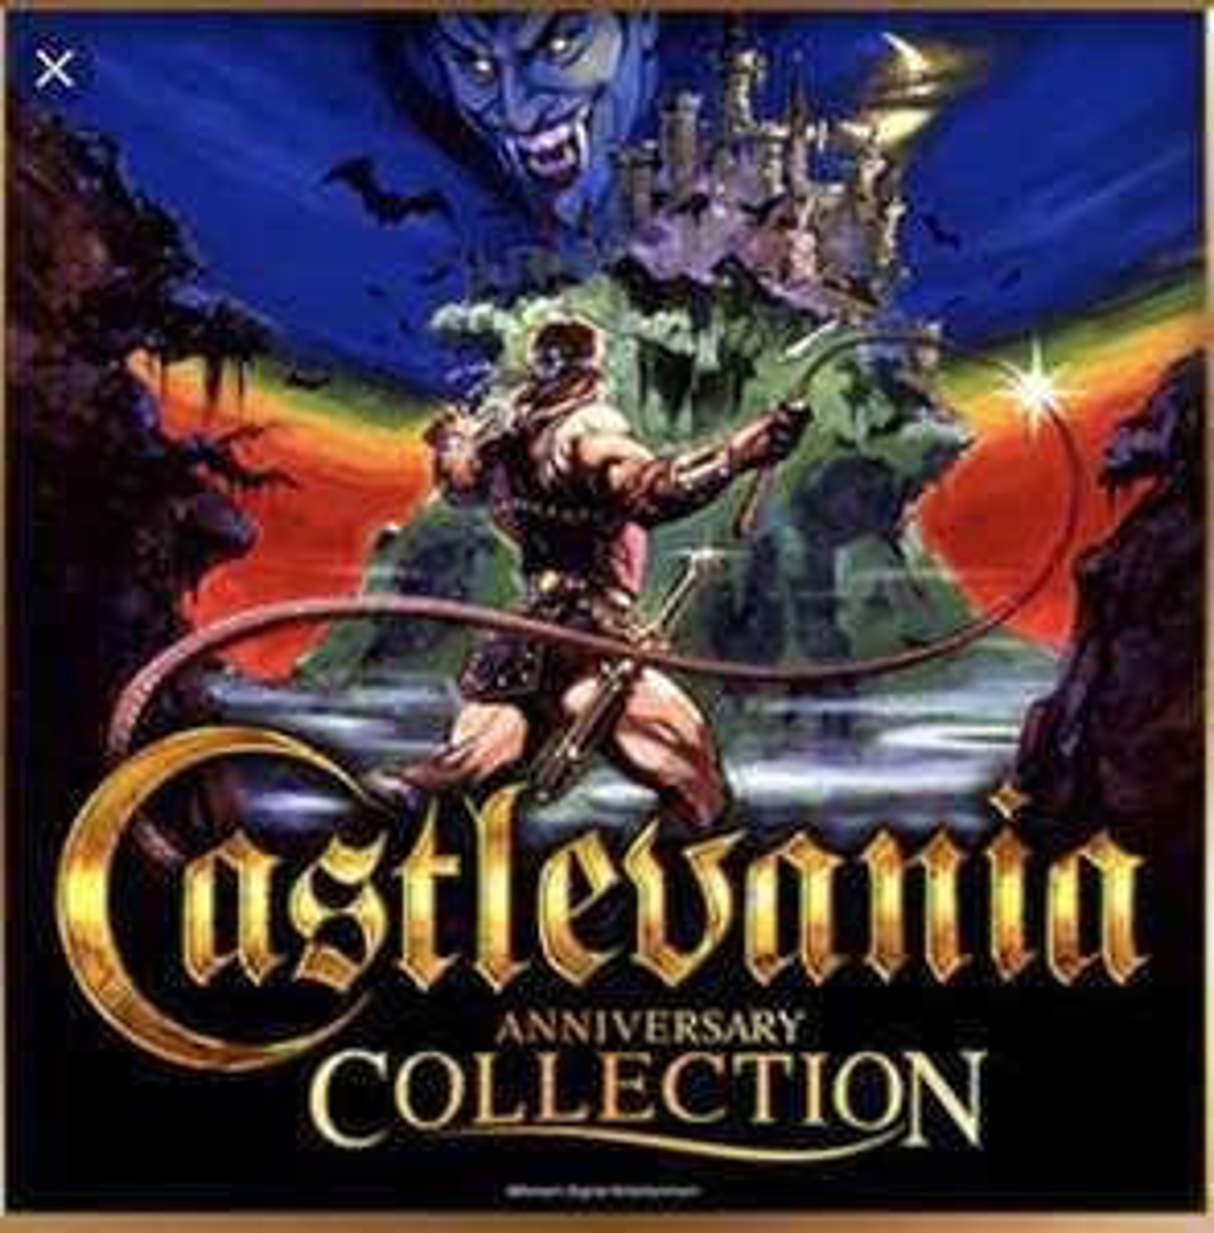 Castlevania Anniversary Collection (Nintendo Switch) - £11.19 @ Nintendo eshop uk